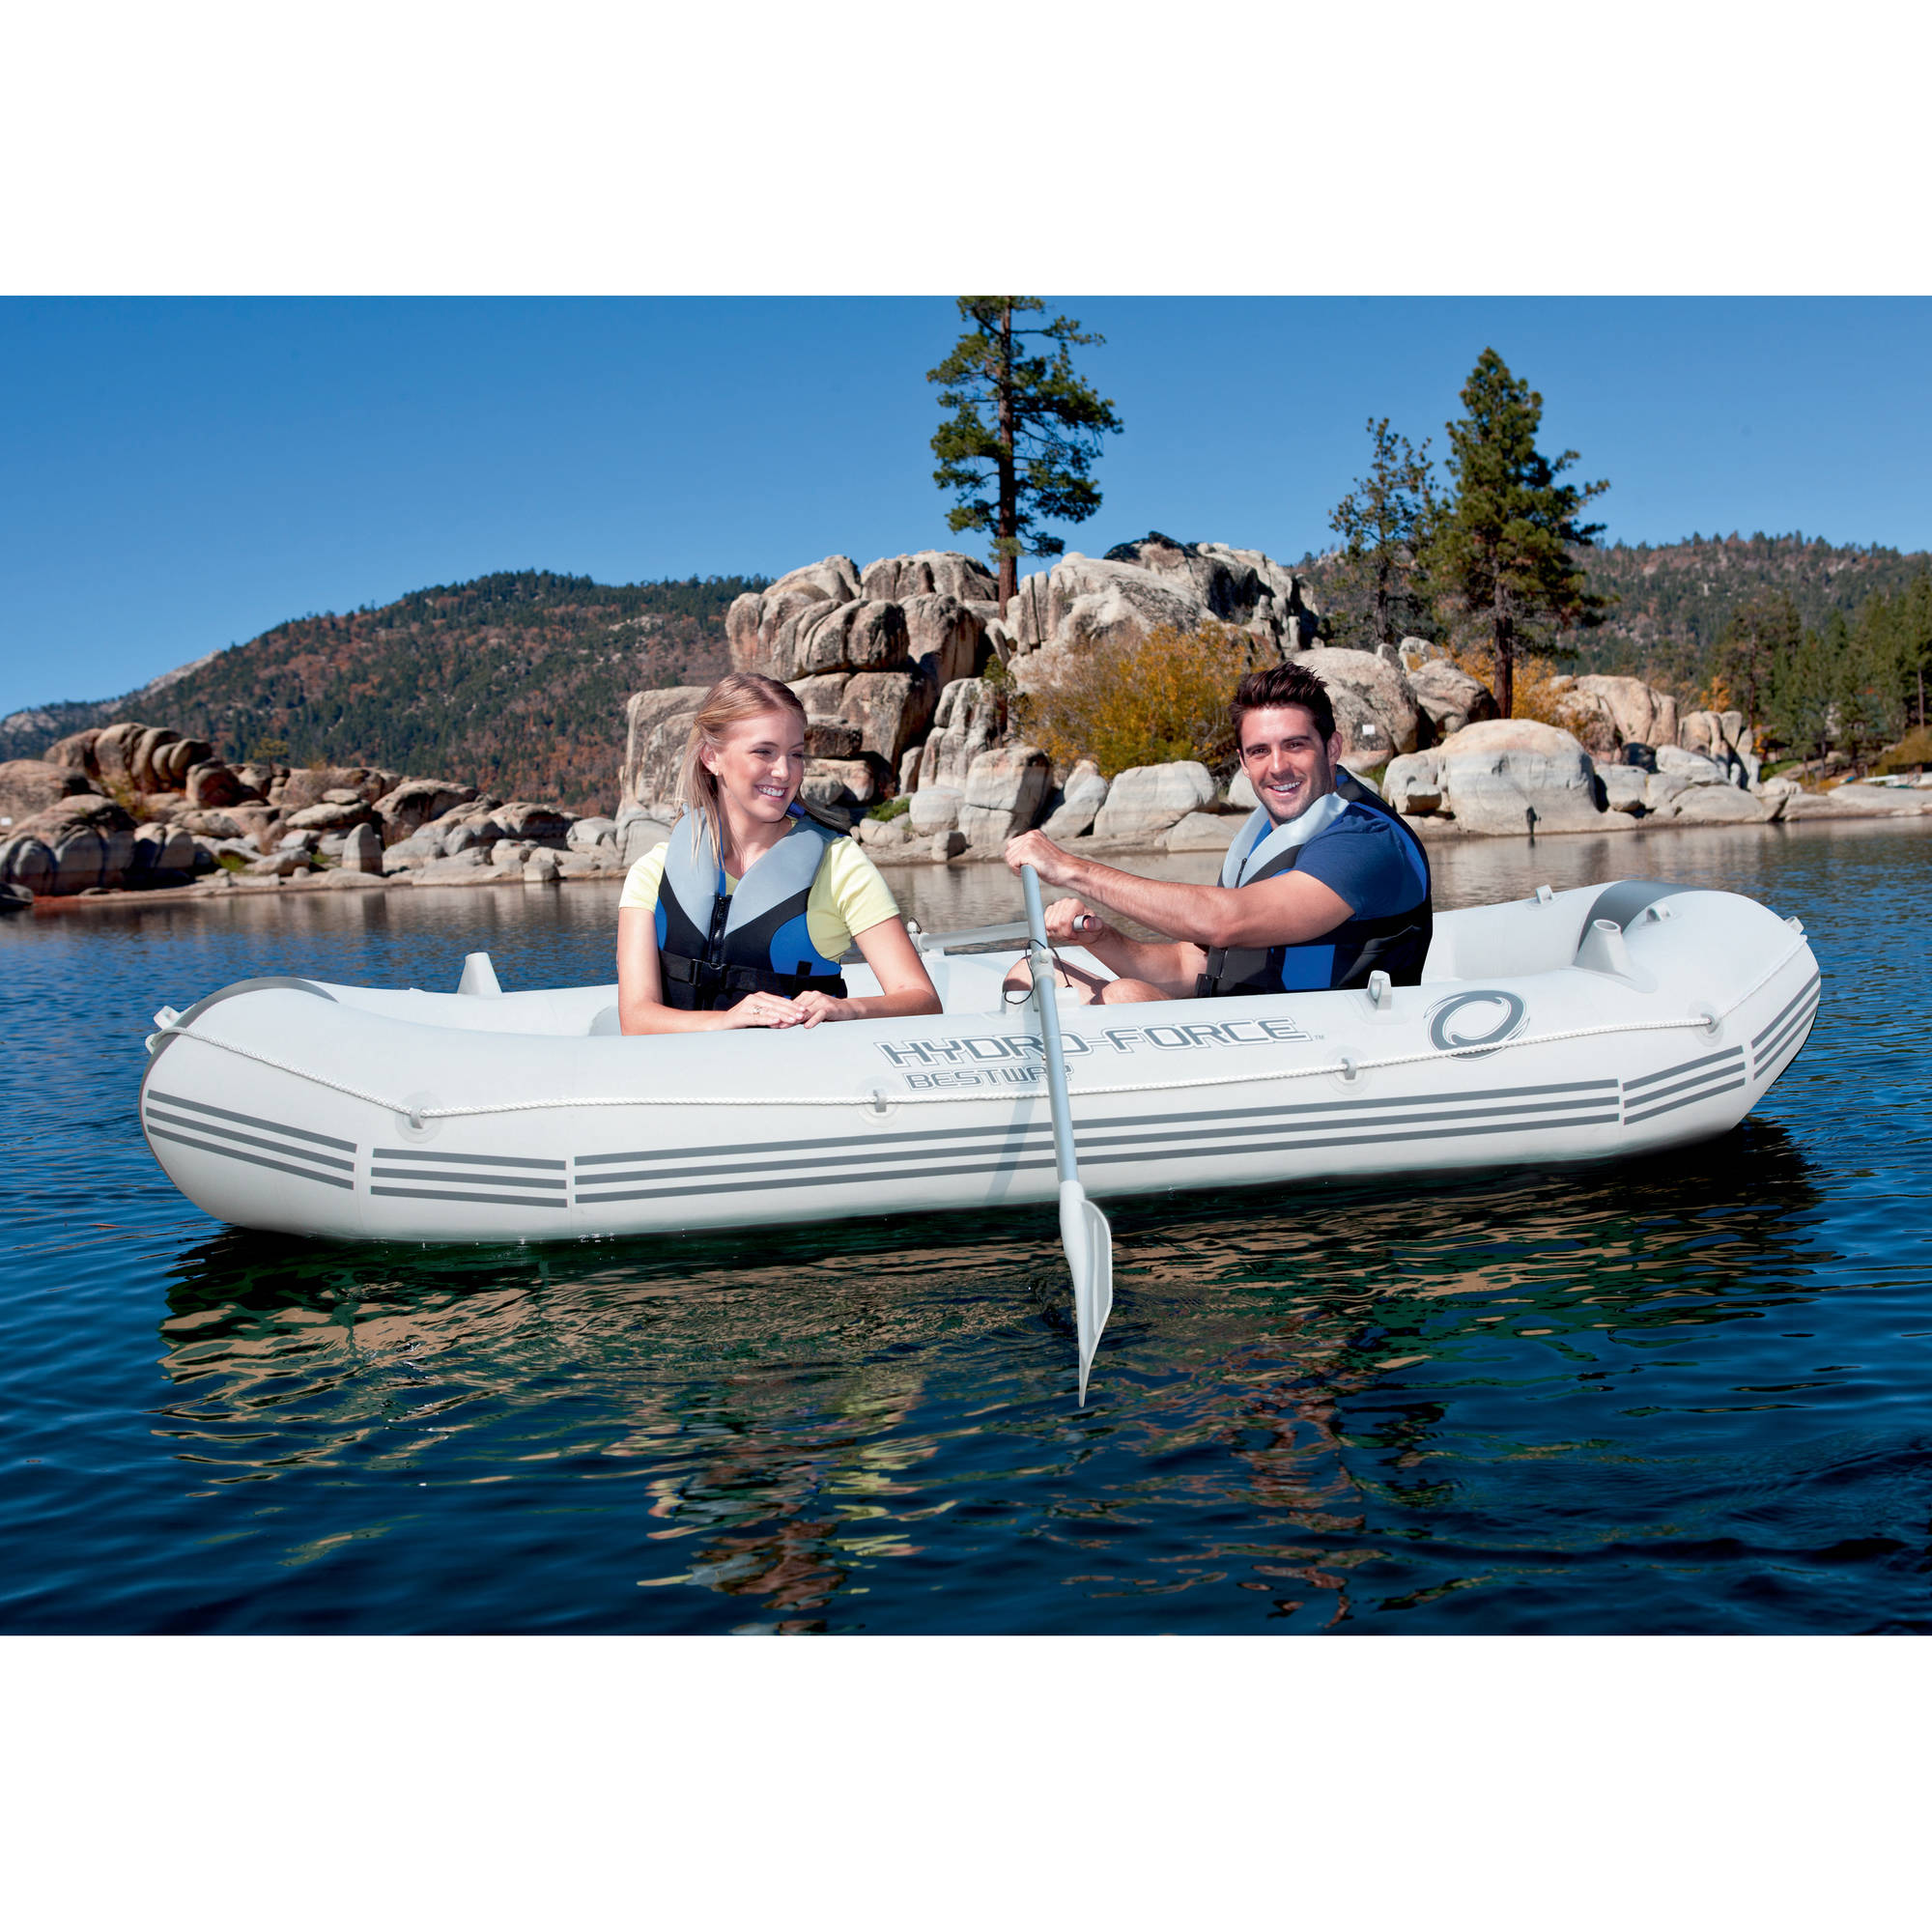 Walmart Boat-Mania Sale